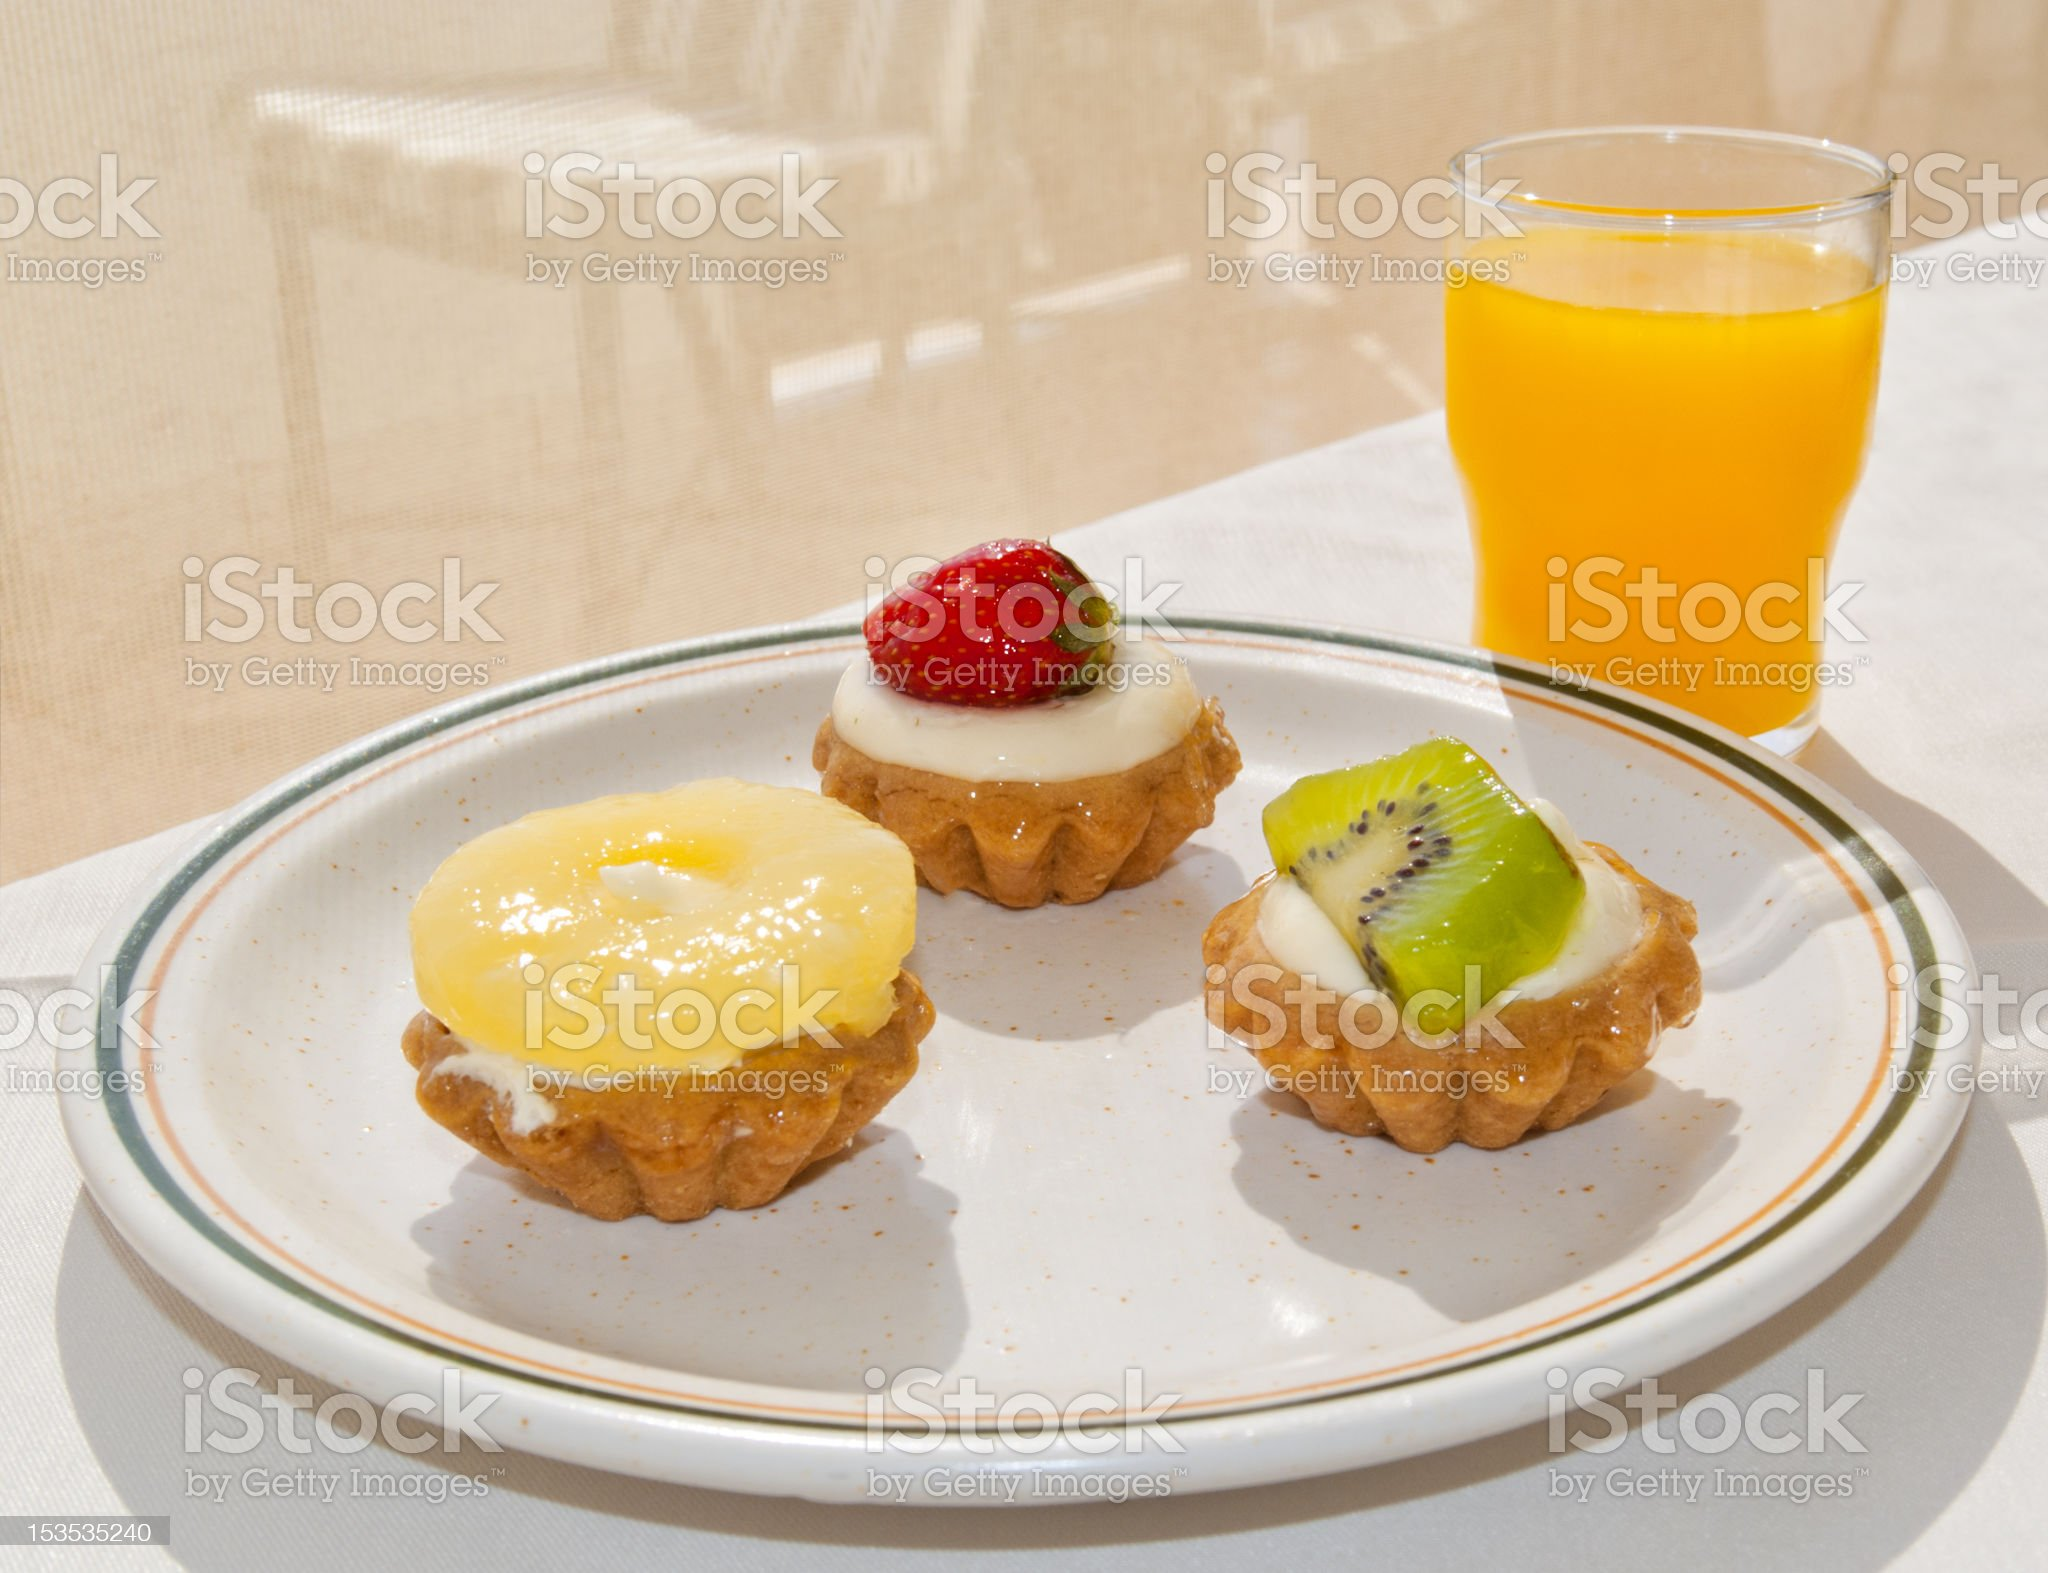 Exquisite breakfast in luxury hotel royalty-free stock photo